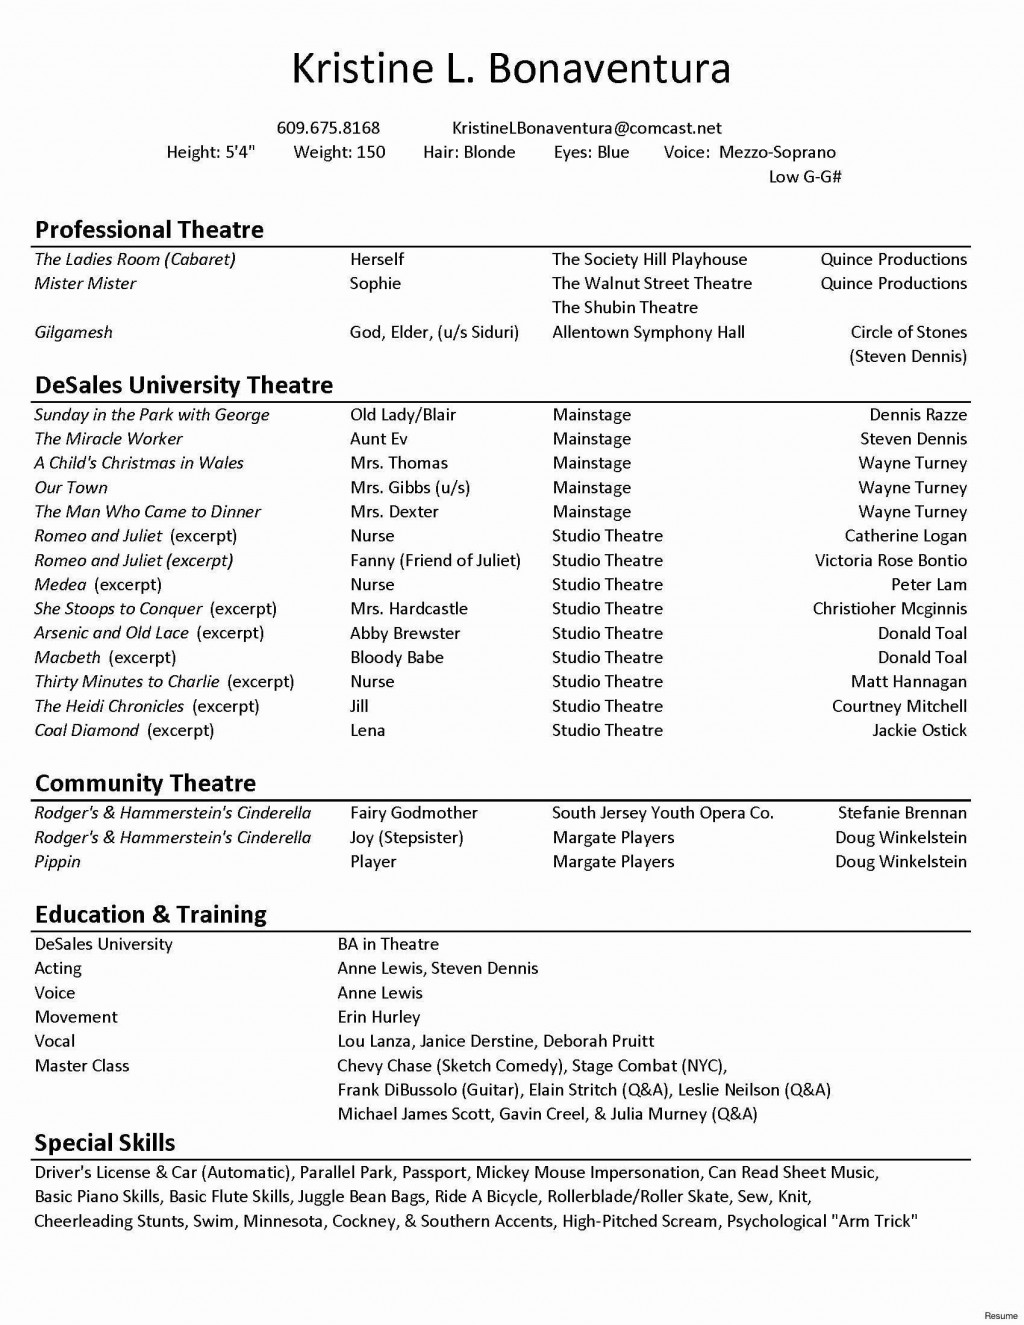 005 Sensational Technical Theatre Resume Template Concept  Google Doc TechLarge